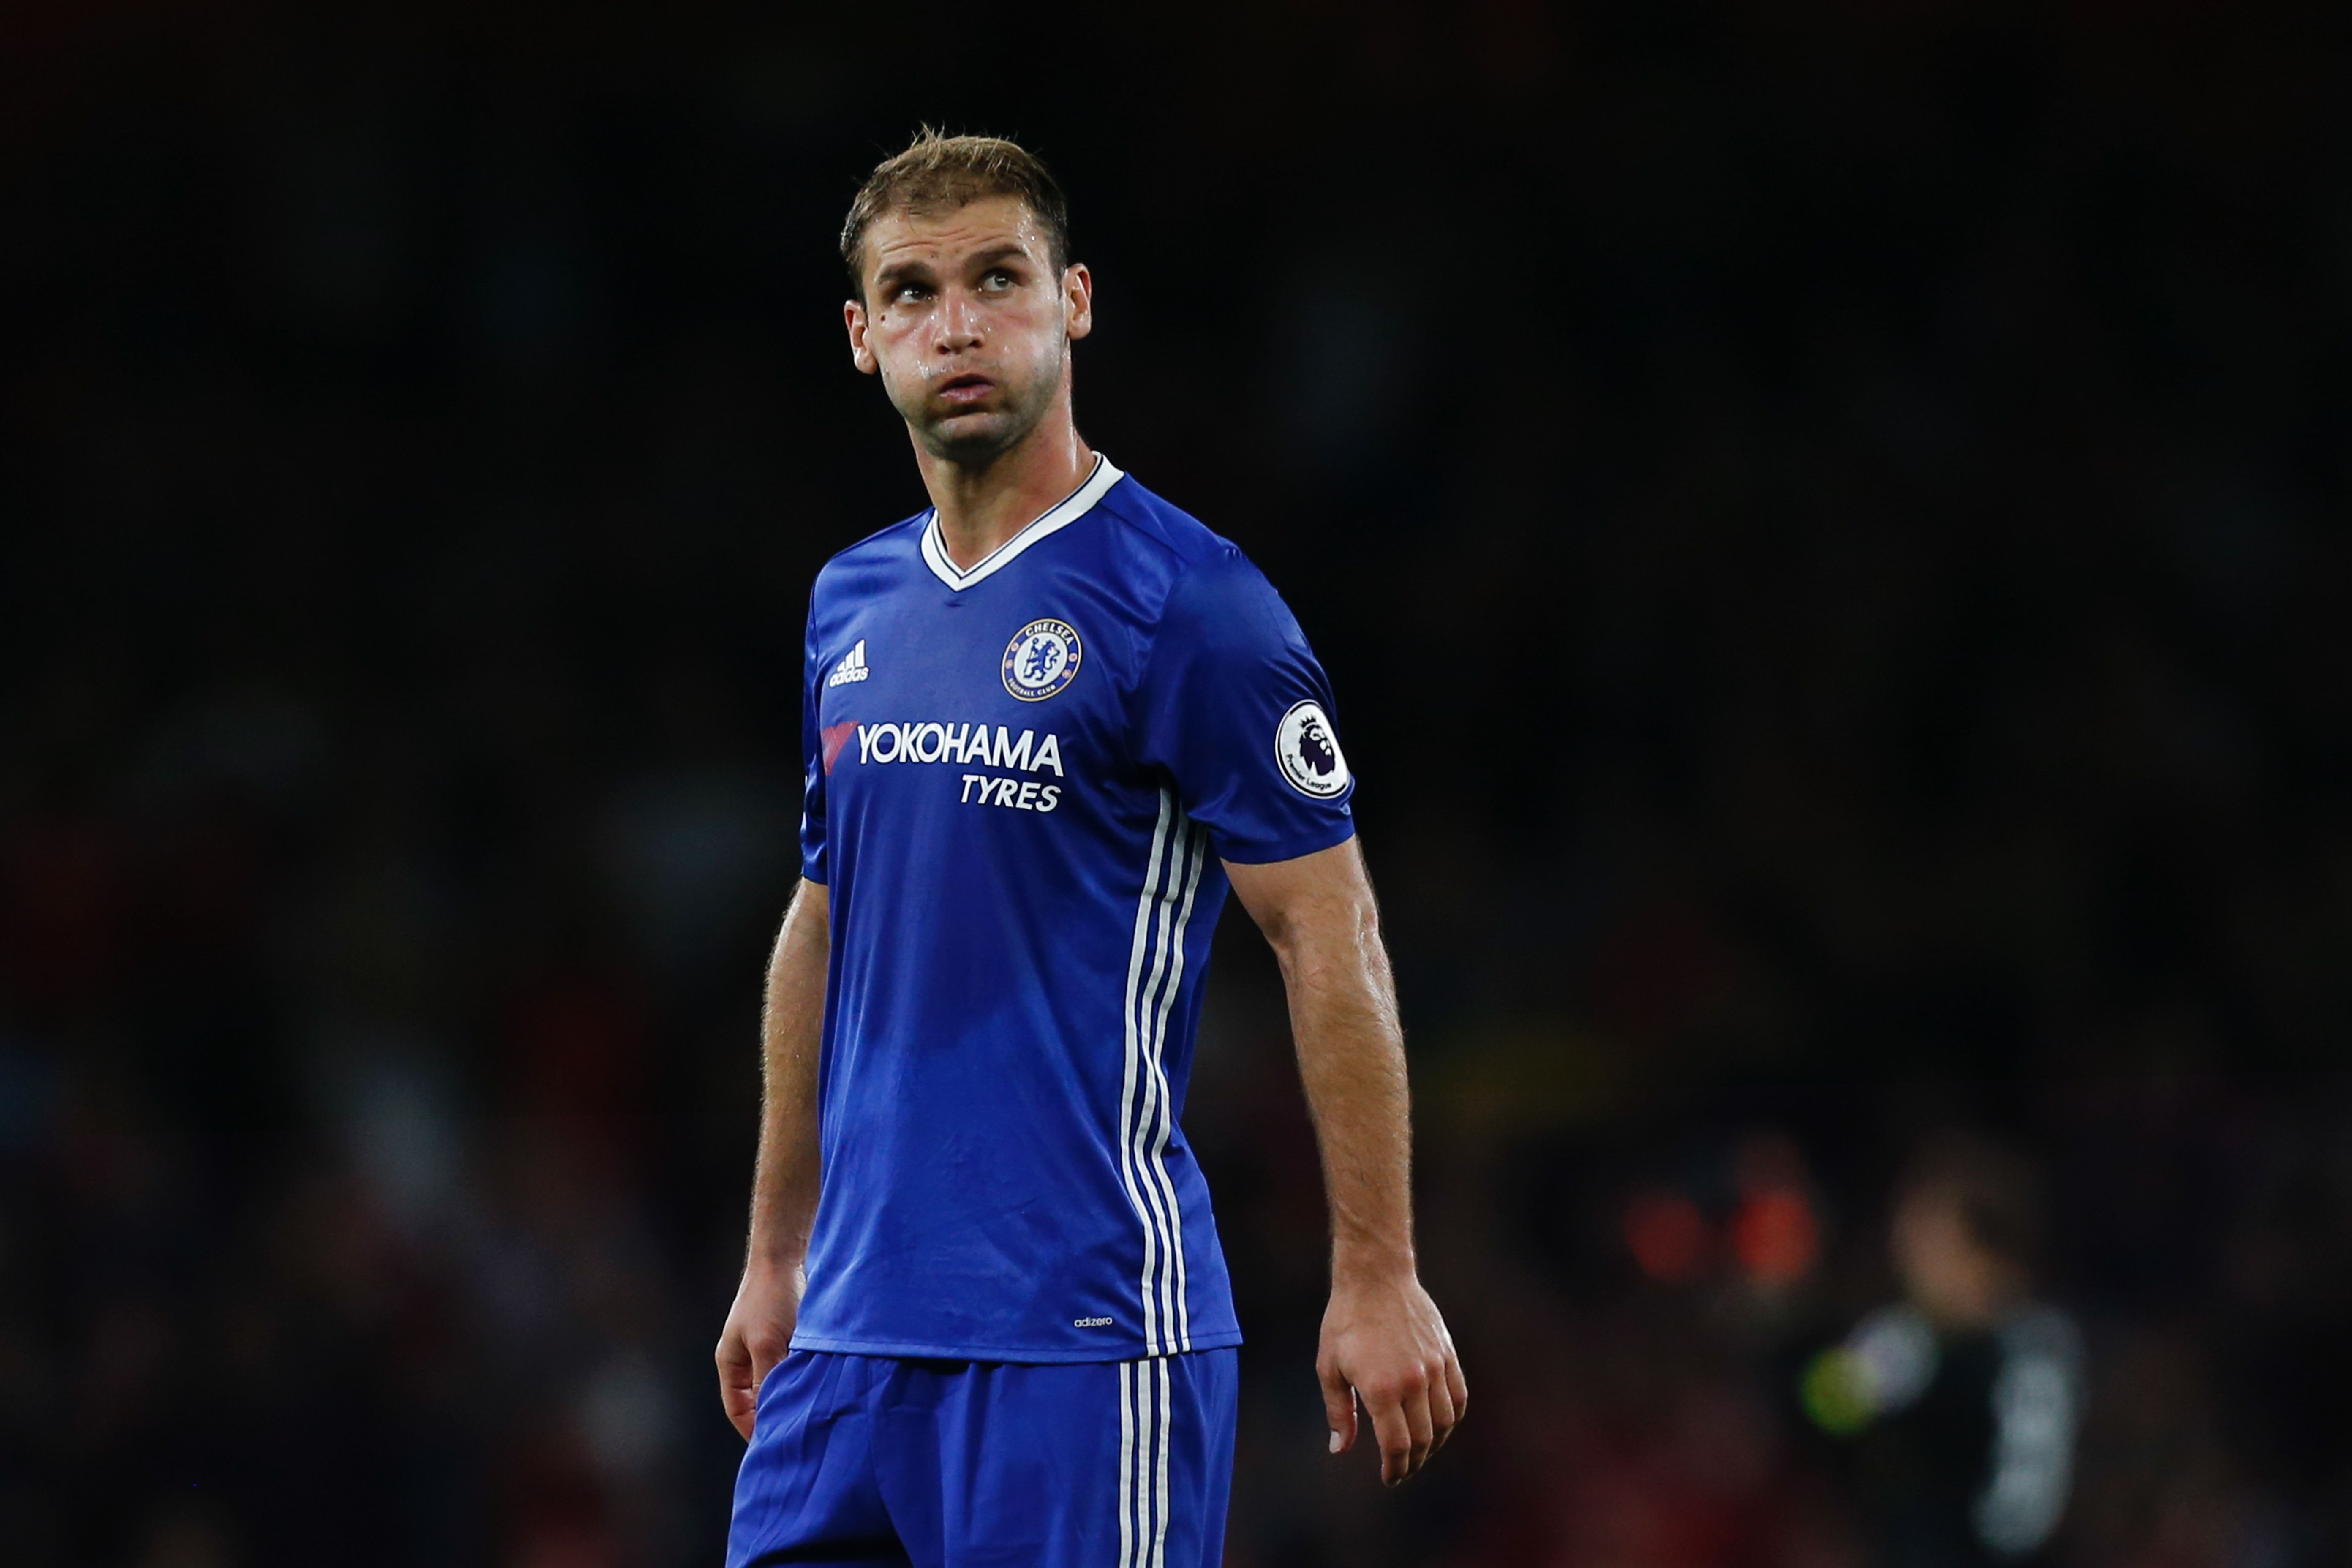 Besiktas closing in on transfer of Chelsea outcast Branislav Ivanovic